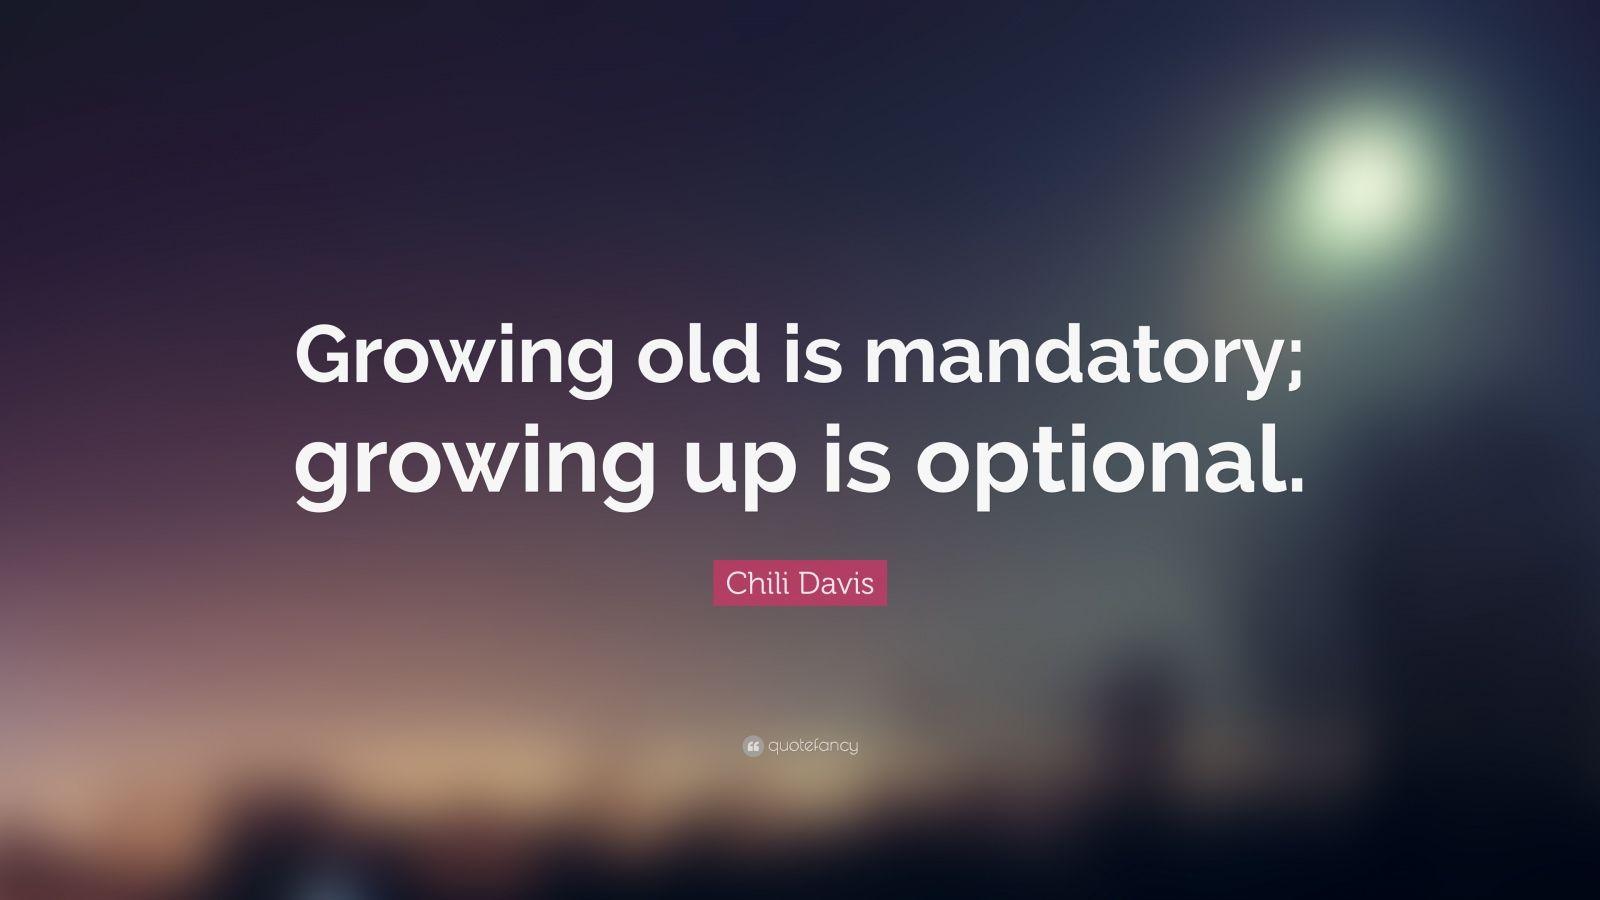 chili davis quote   u201cgrowing old is mandatory  growing up